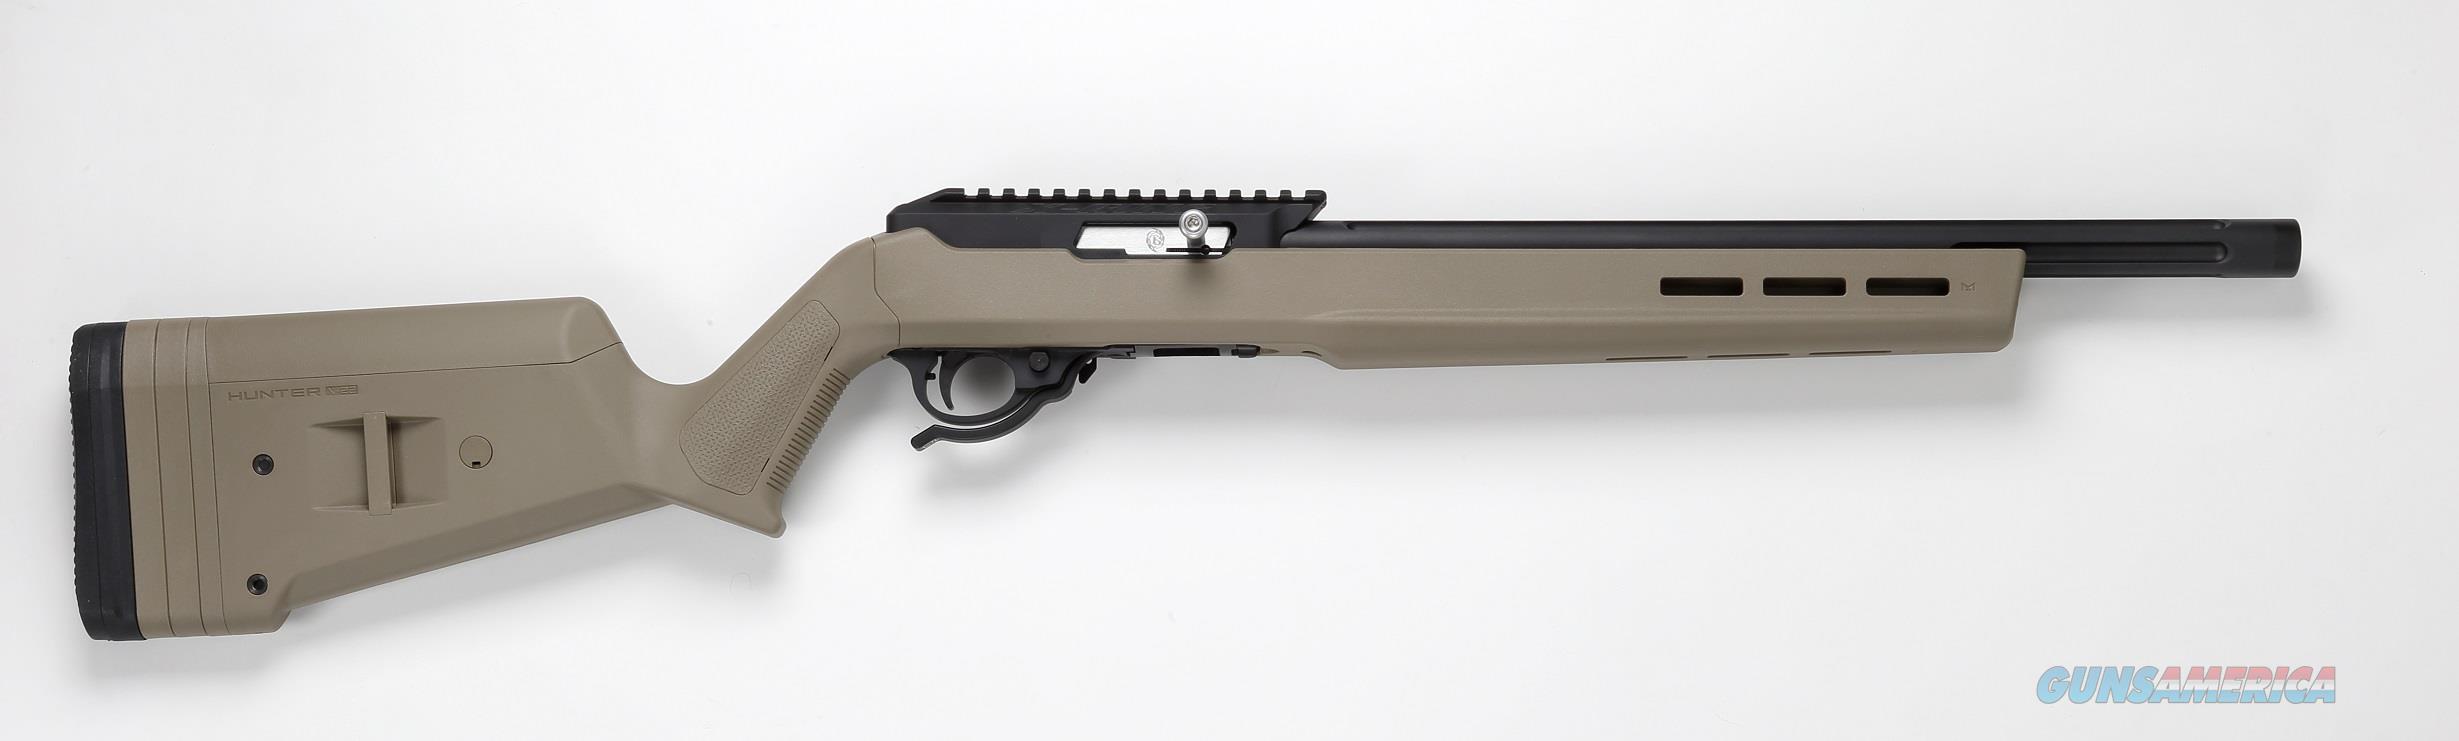 TACTICAL SOLUTIONS X-RING RIFLE MAGPUL HUNTER X-22 BLACK / FLAT DARK EARTH .22 LR 10/22 TE-MB-B-M-FDE  Guns > Rifles > Ruger Rifles > 10-22